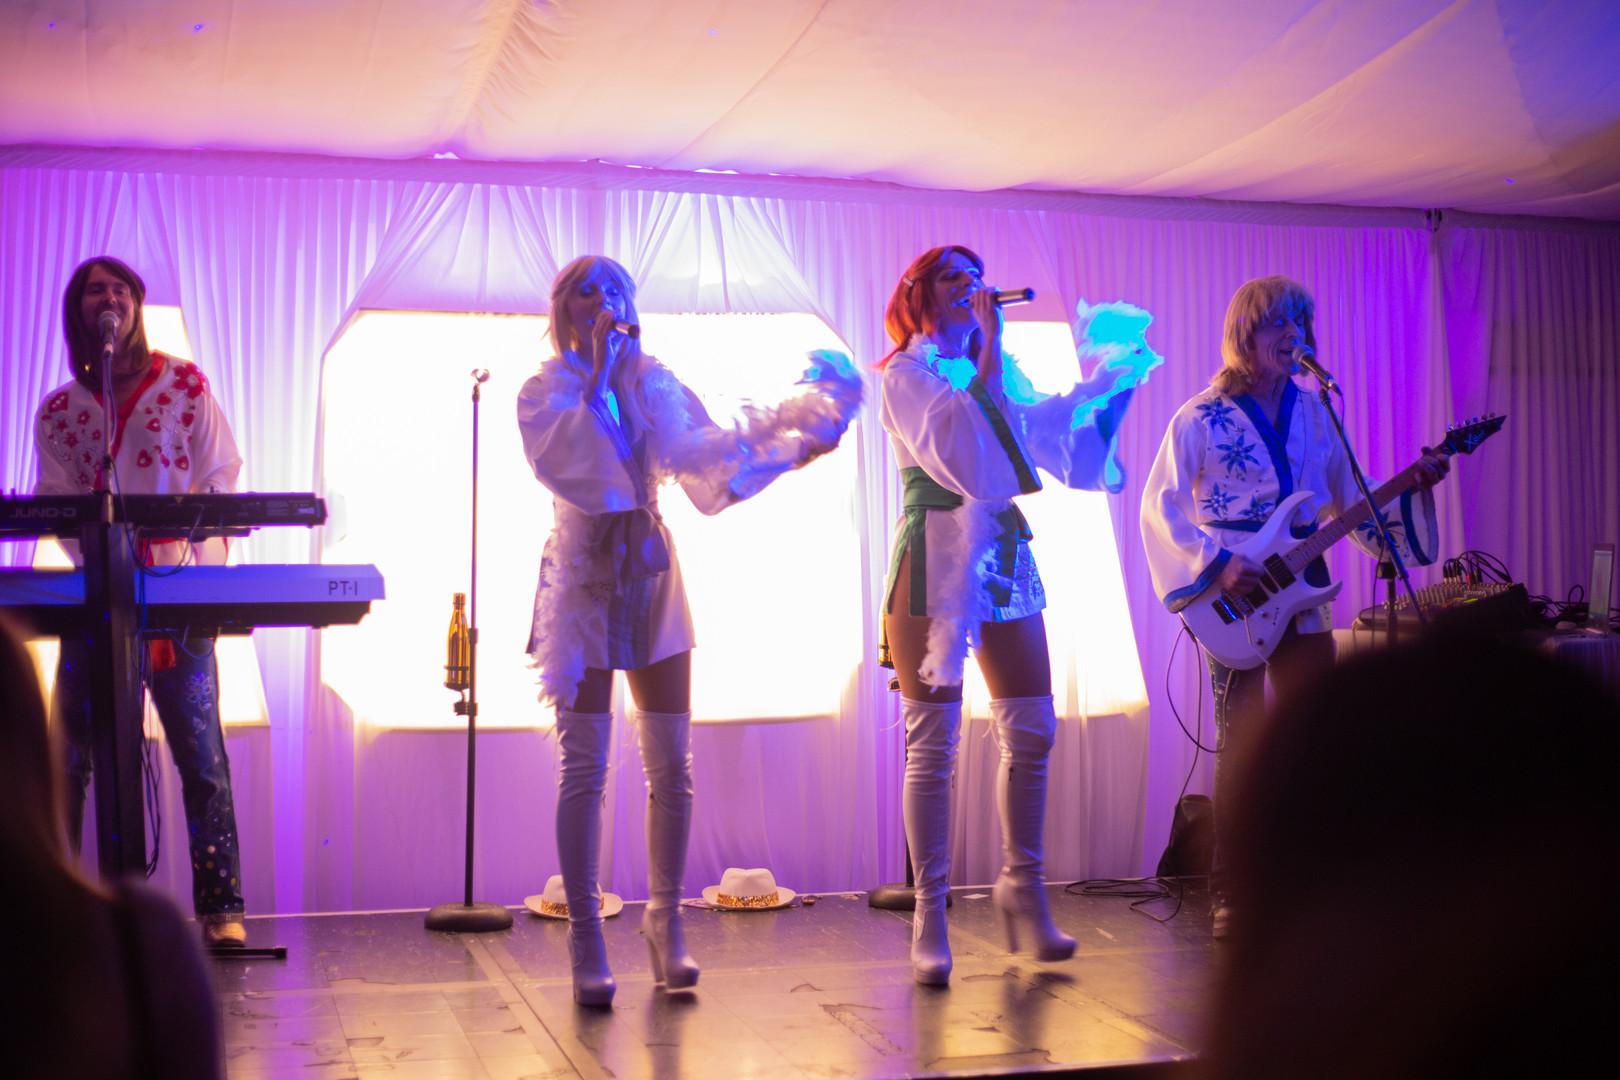 ABBA Chique tribute night